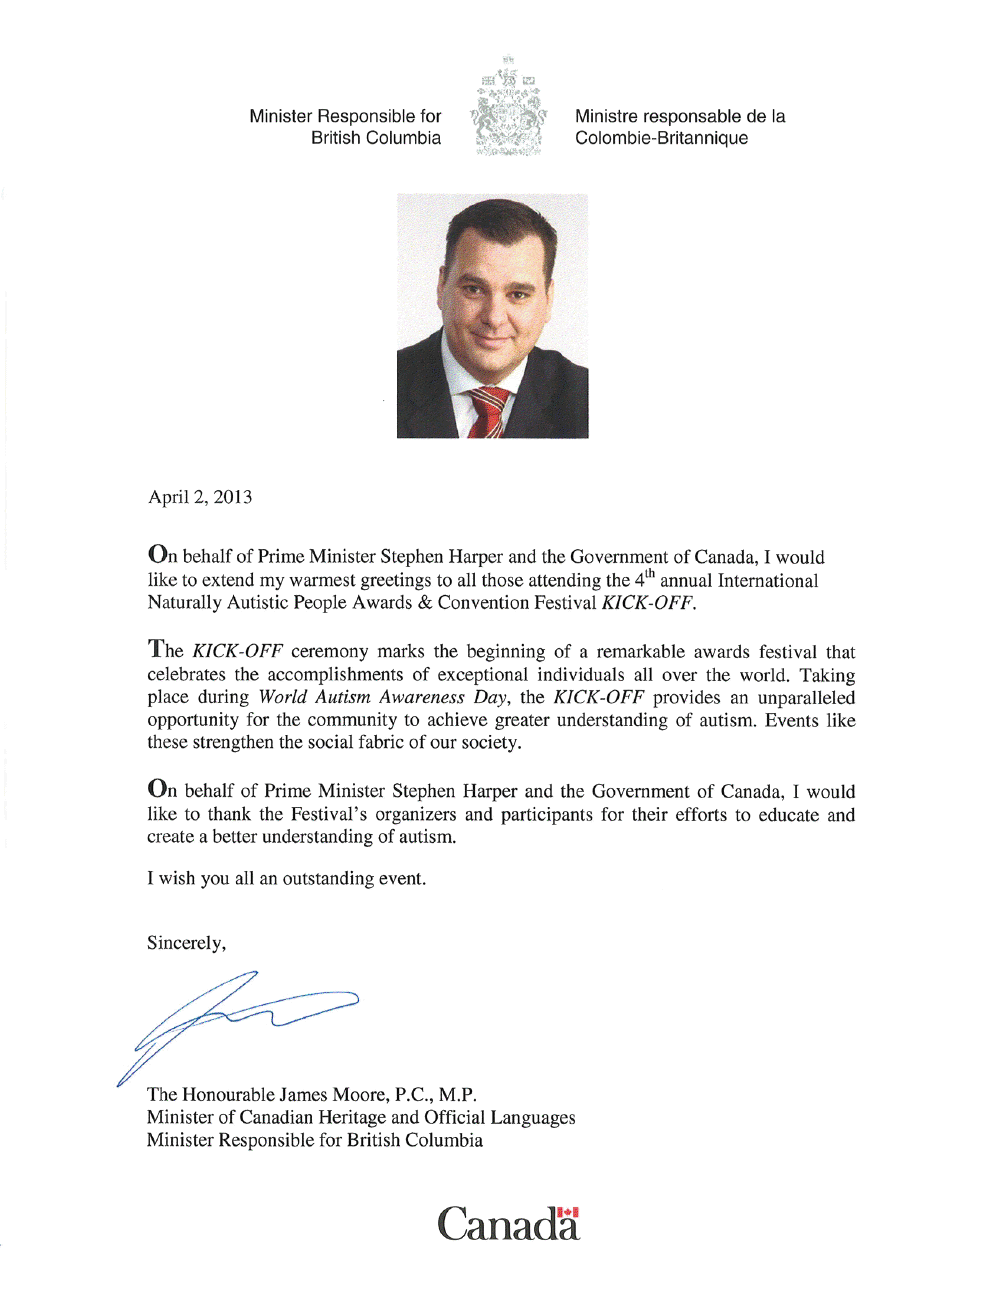 2013 James Moore Kick Off letter